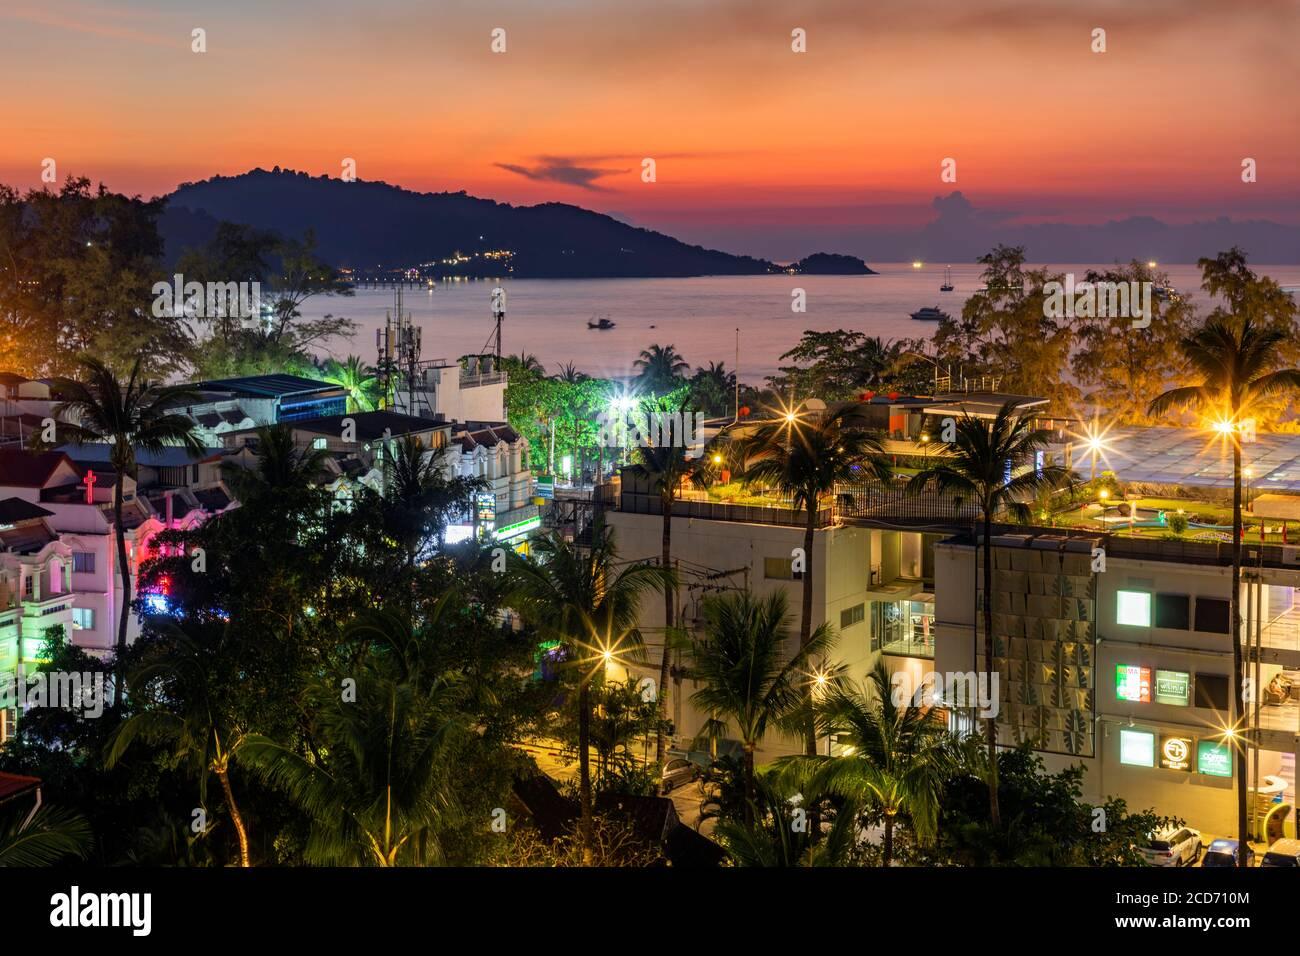 Sonnenuntergangslandschaft, Patong, Phuket, Thailand Stockfoto